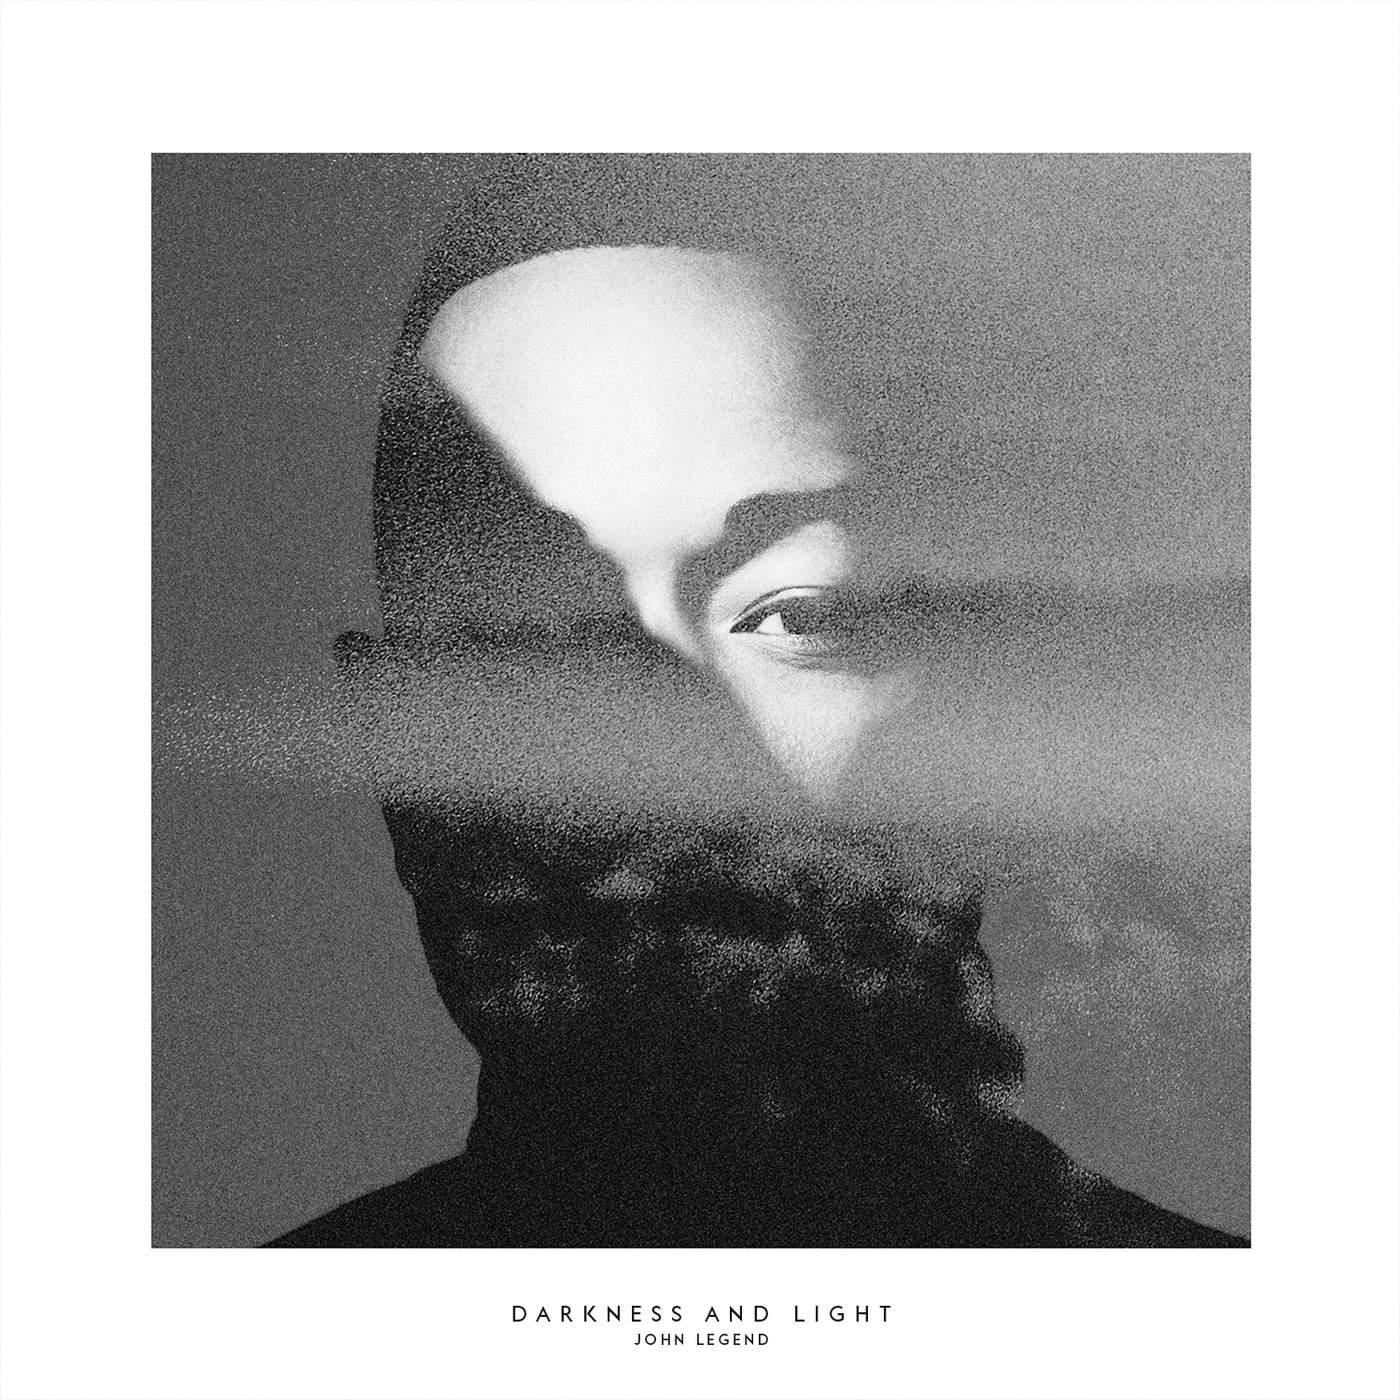 John Legend - I Know Better - Single Cover